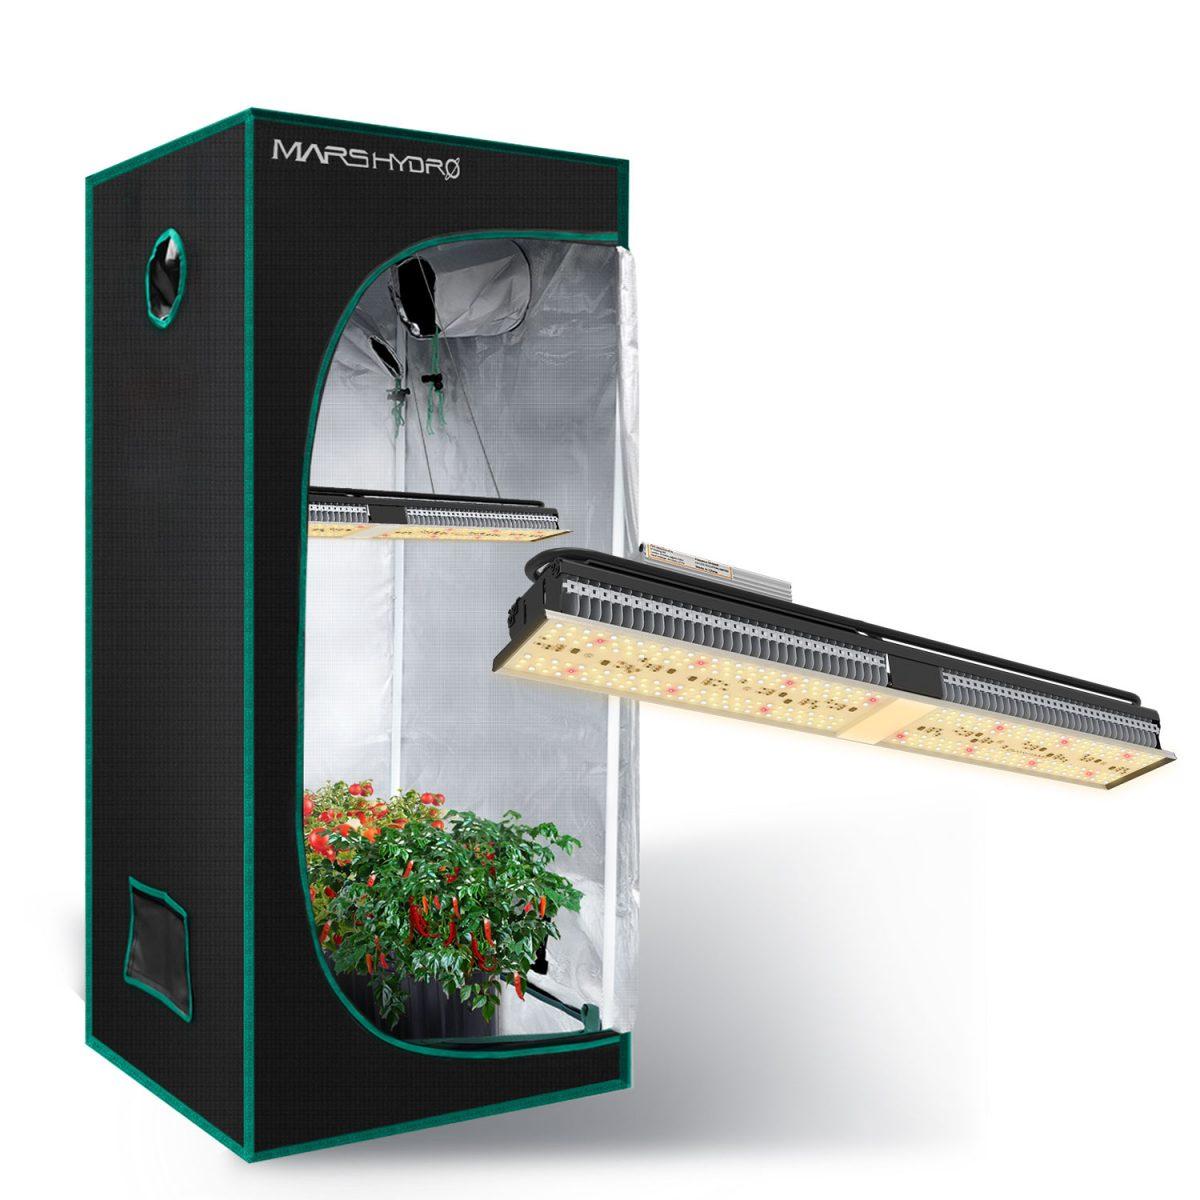 SP150 Led grow light with 70x70x160cm grow tent